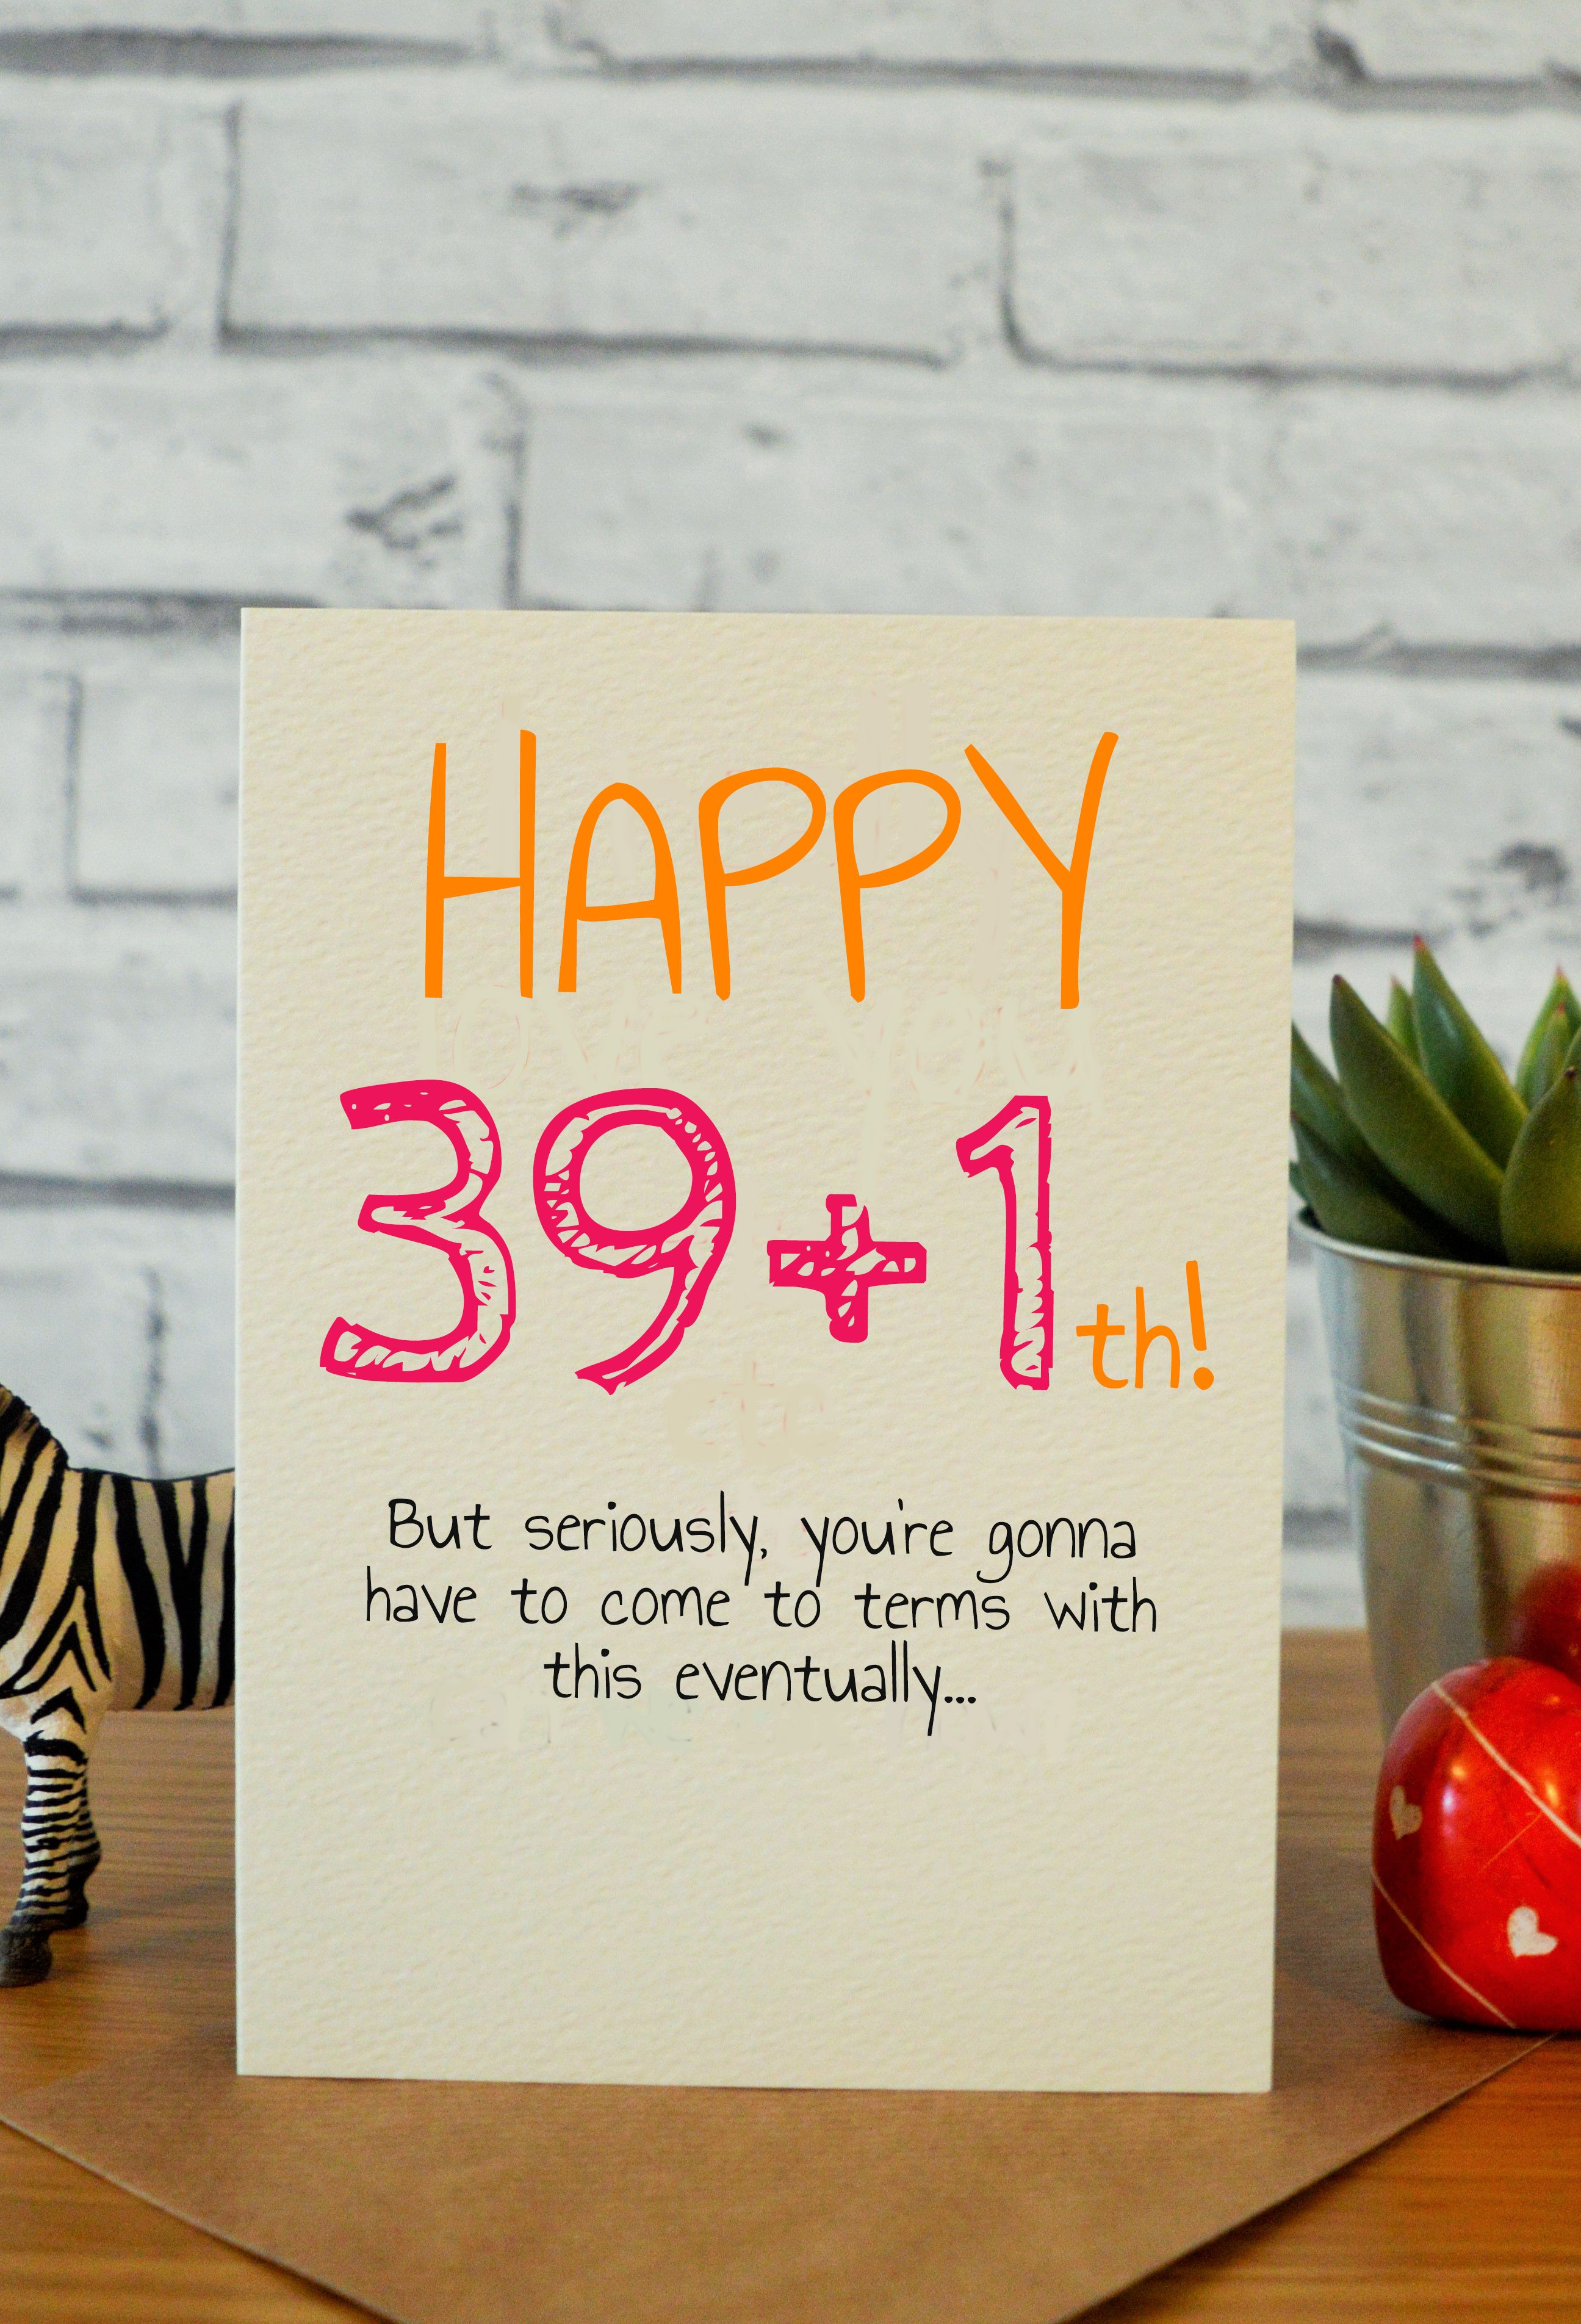 391th 60th birthday cards 40th birthday cards